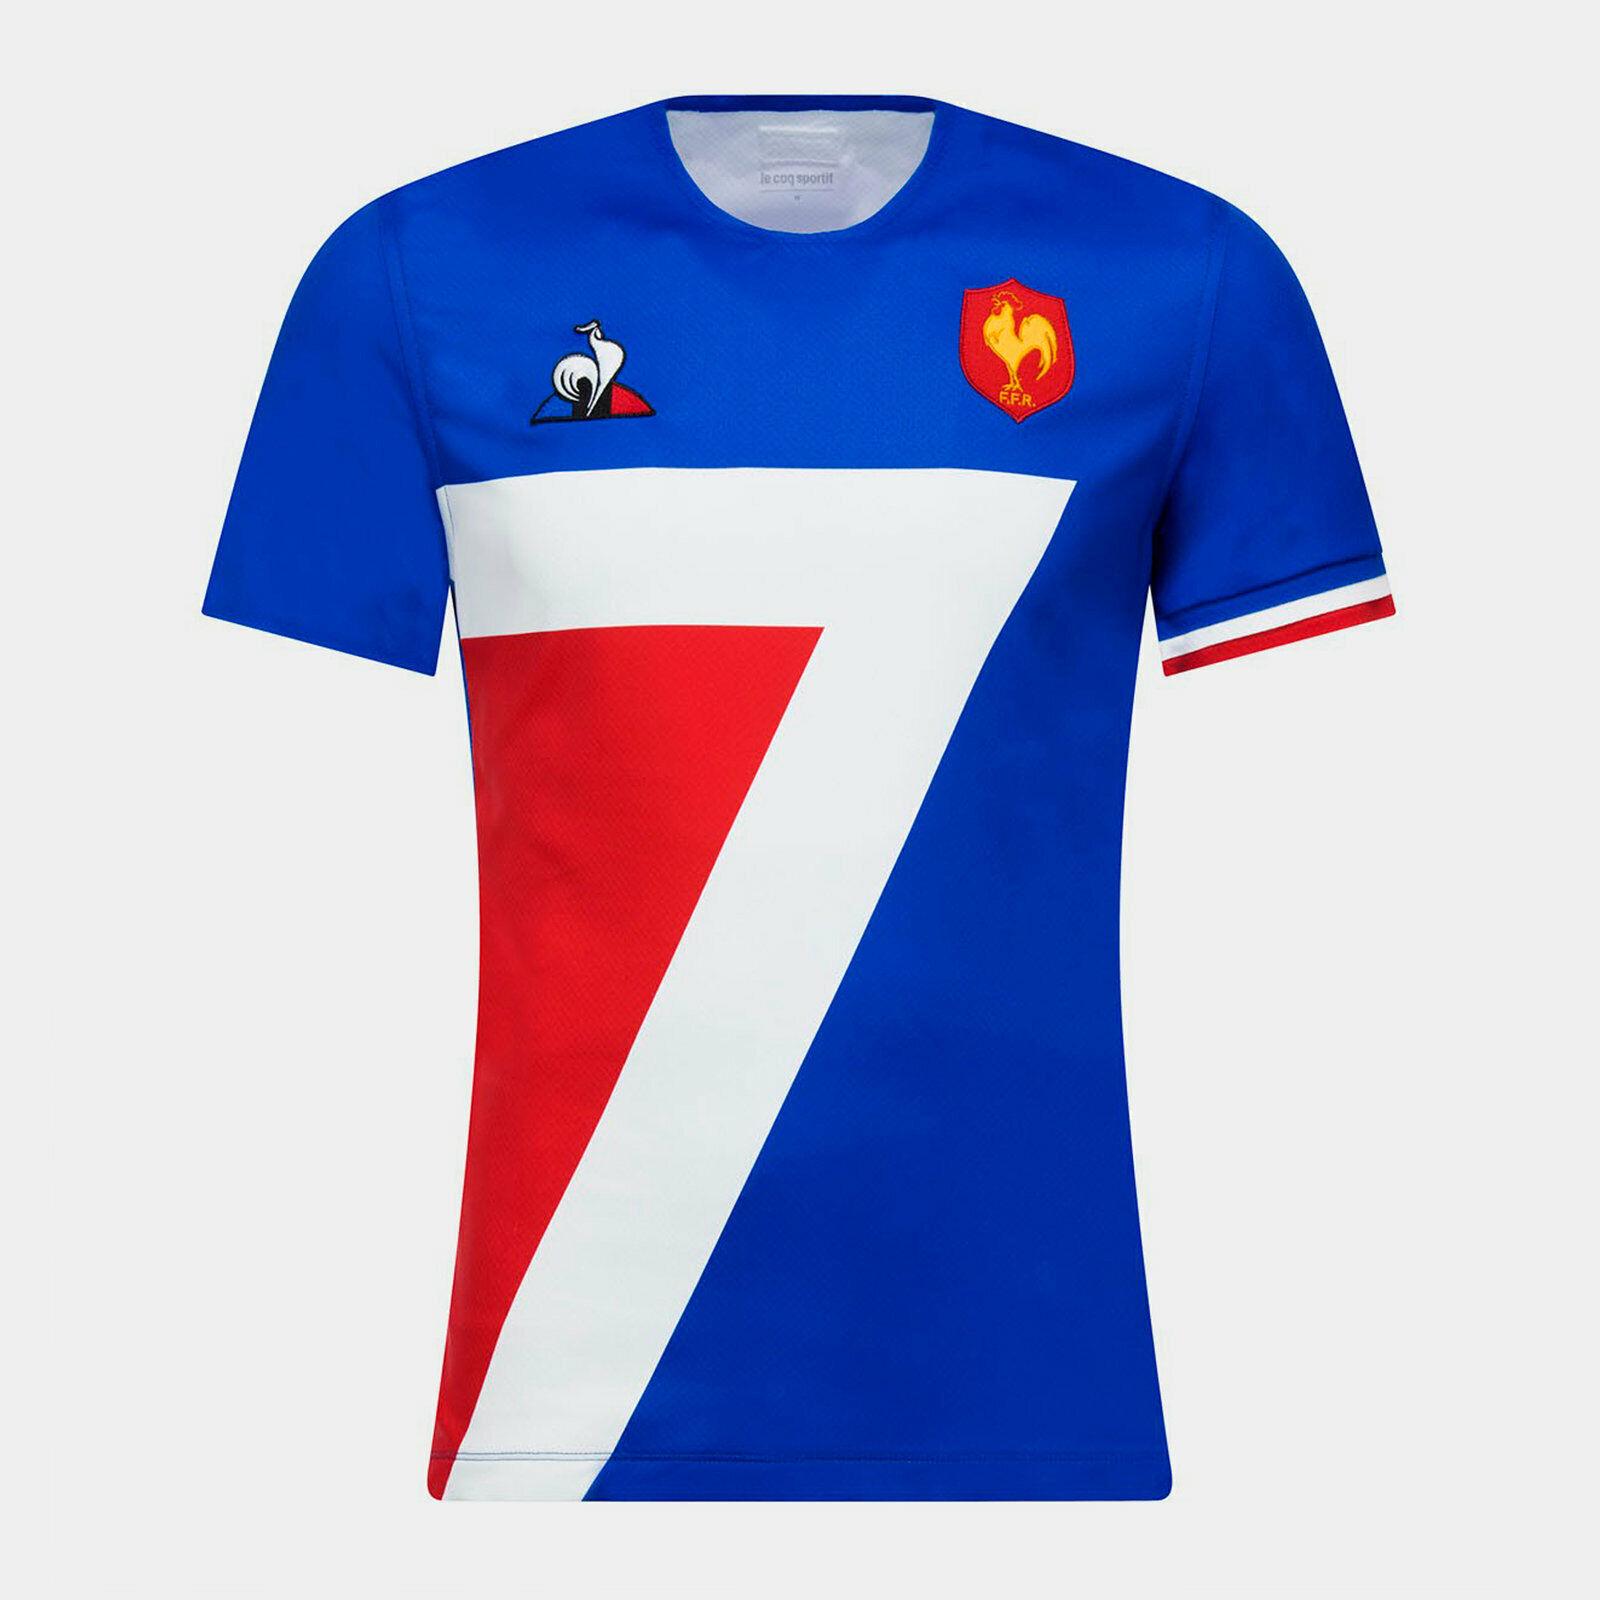 Le Coq Sportif Da Uomo Francia 7s 2018 19 HOME Manica Corta Rugby Camicia Blu